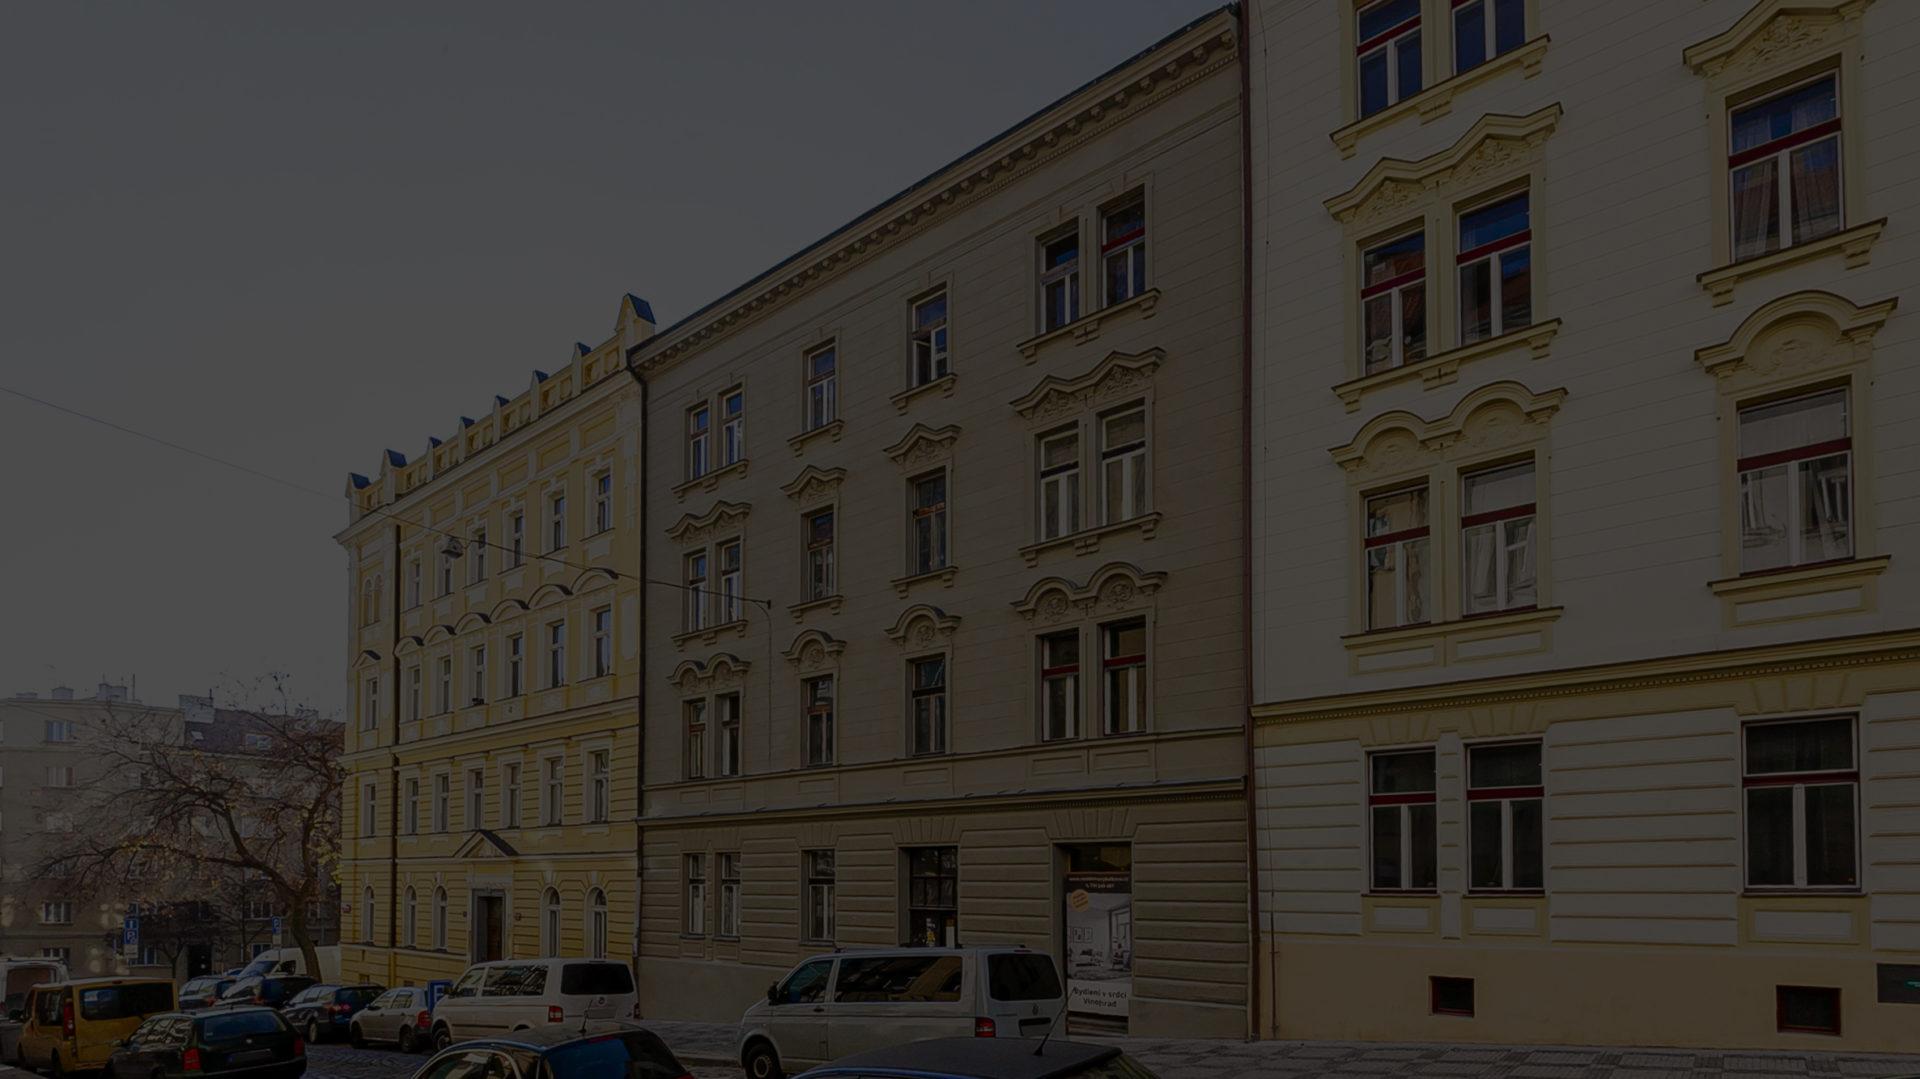 The Rybalkova Residence